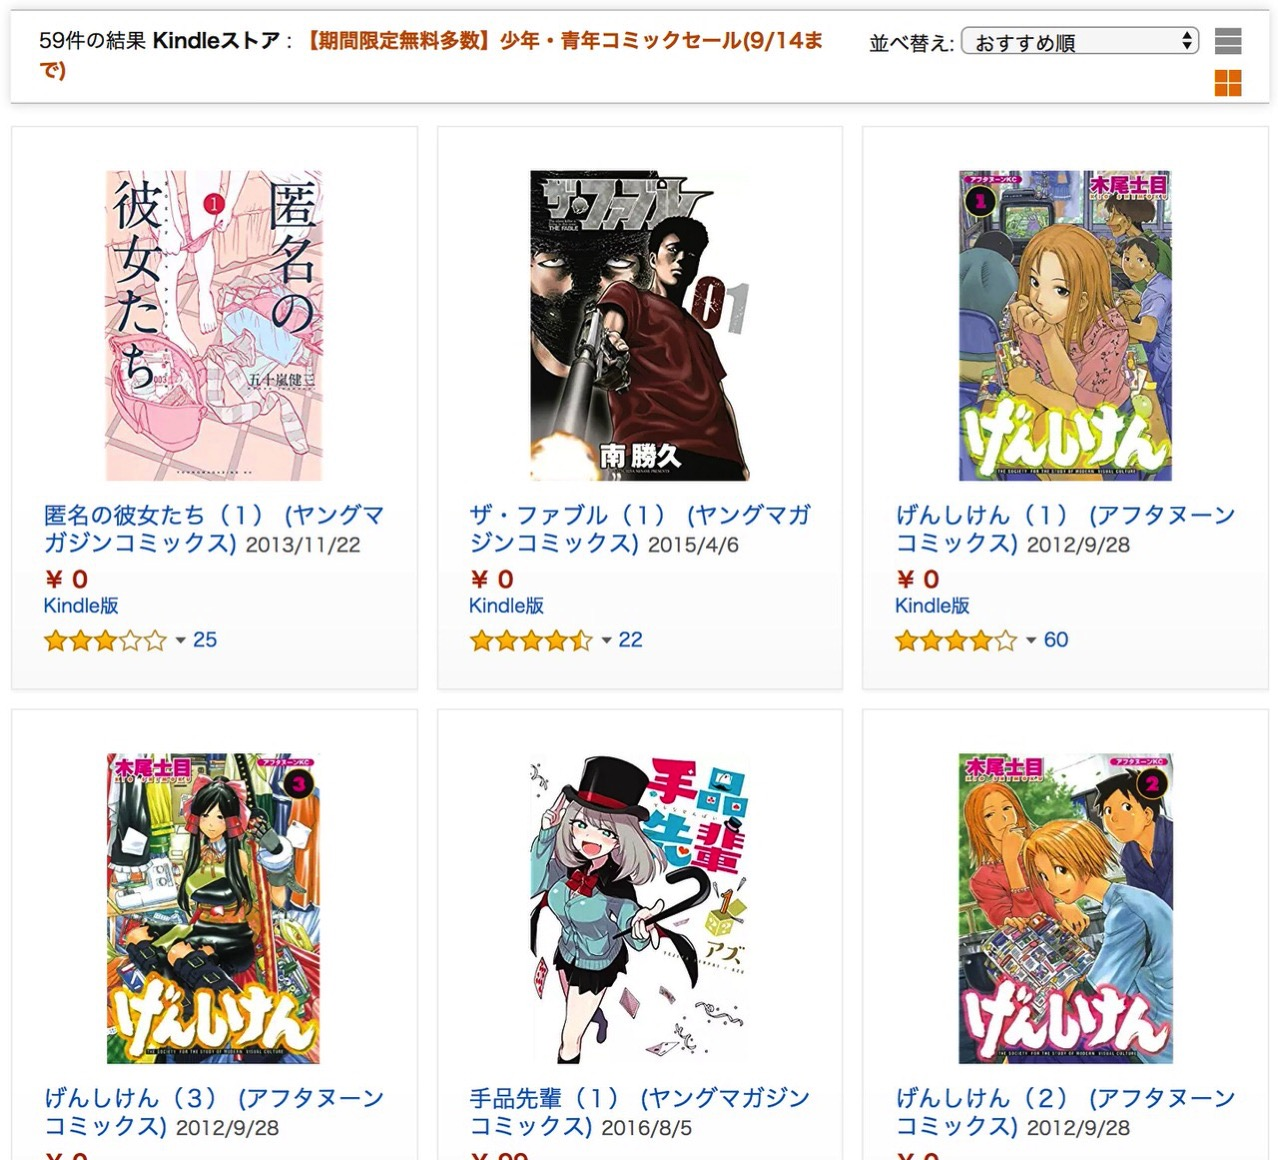 【Kindleセール】期間限定無料多数「少年・青年コミックセール」(〜9/14)匿名の彼女たち・ファブル・スモーキング・ラッキーマインなど